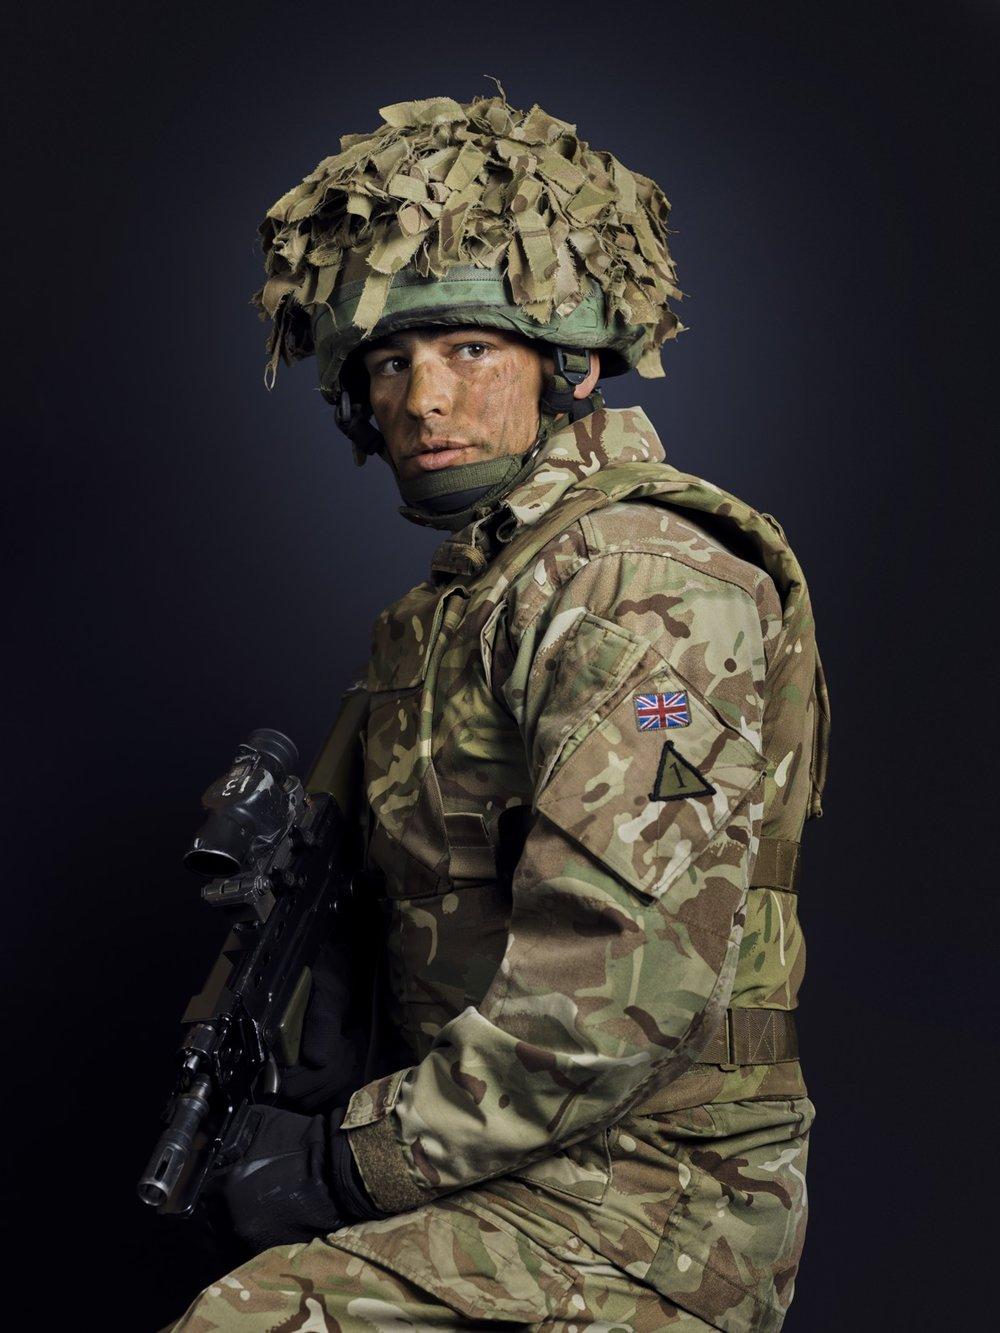 Tpr Millward The Royal Tank Regiment (Rory Lewis London Portrait Photographer)